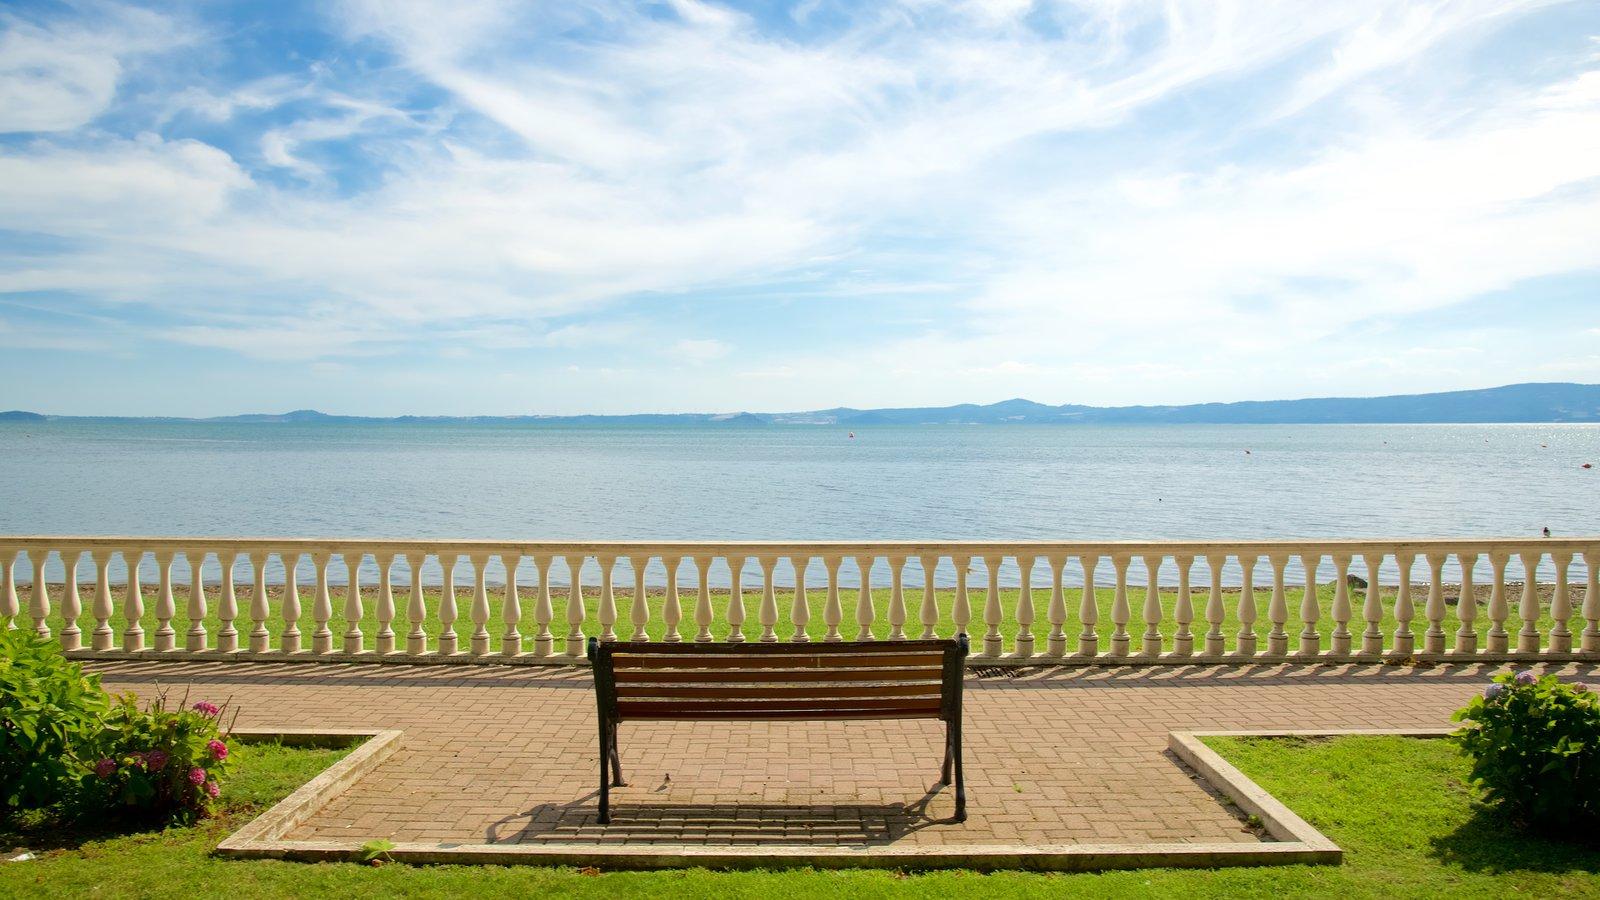 Lake Bolsena showing general coastal views